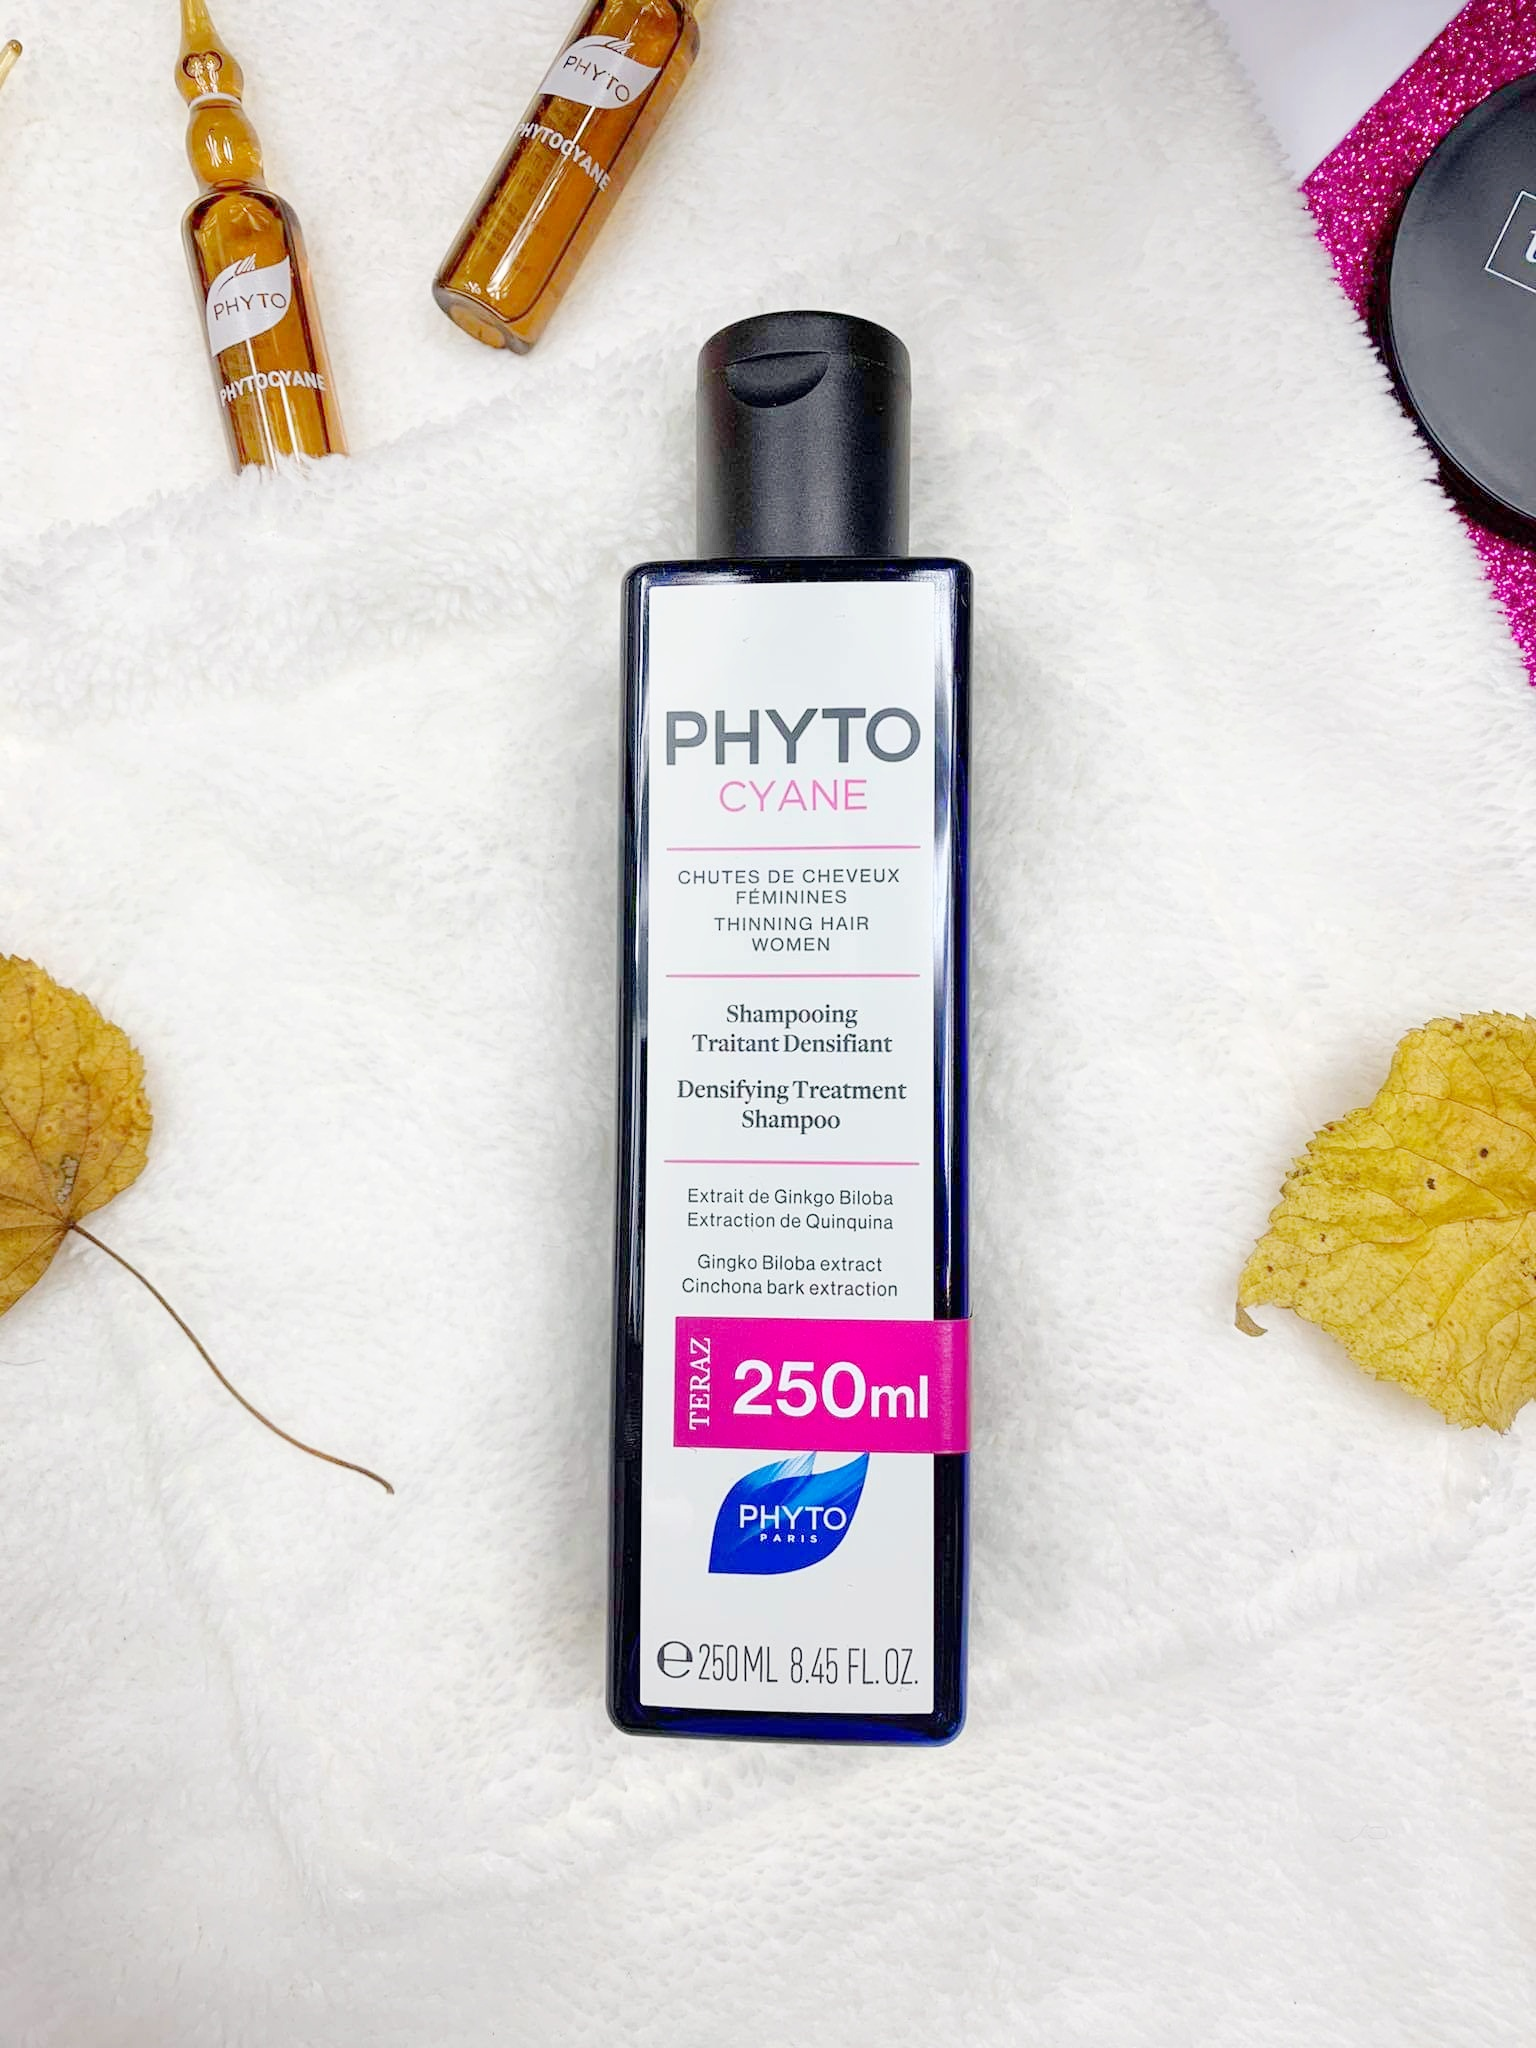 Phytocyane szampon i ampułki, Topestetic